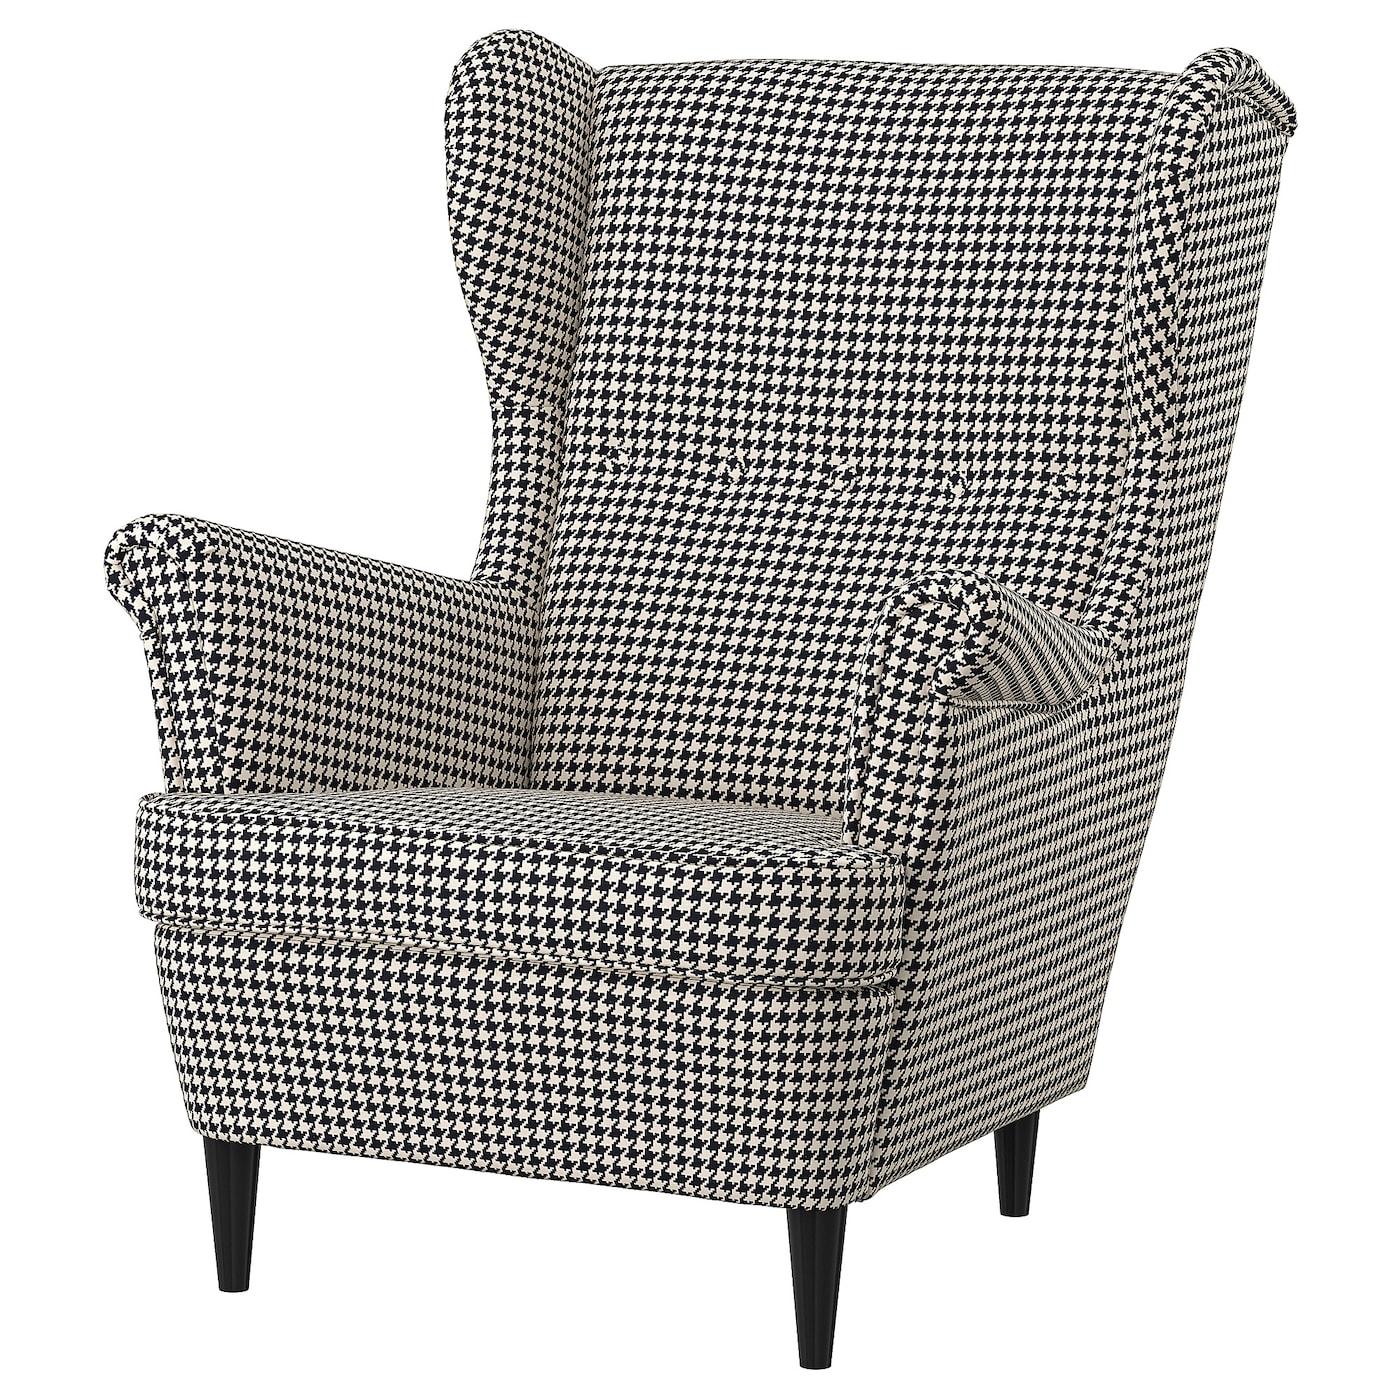 Strandmon Wing Chair Vibberbo Black